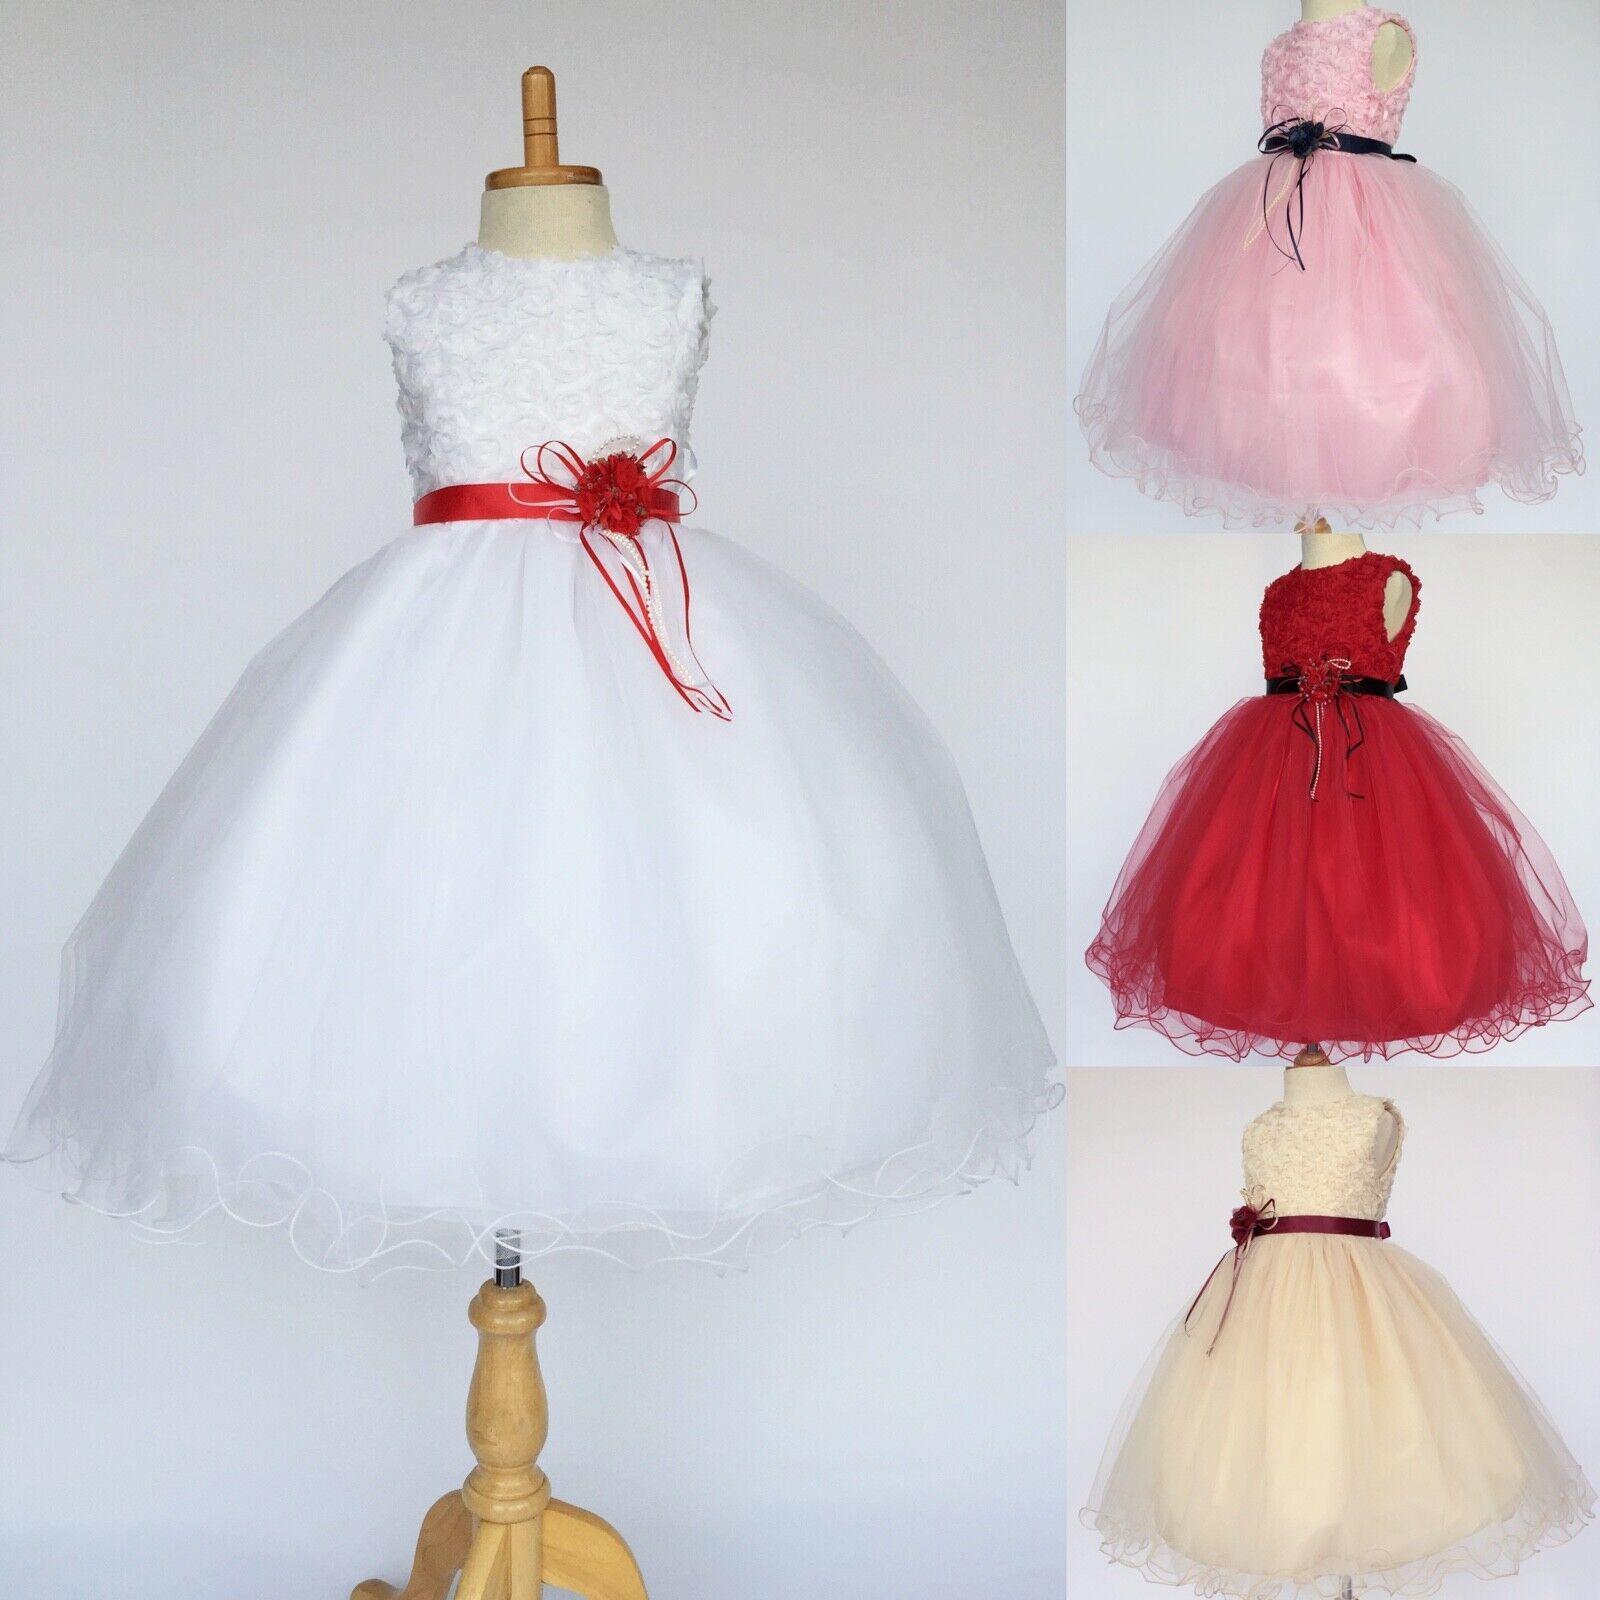 Floral Chiffon 2 Layer Tulle Flower Girl Dress Wedding Birthday Pageant Recital